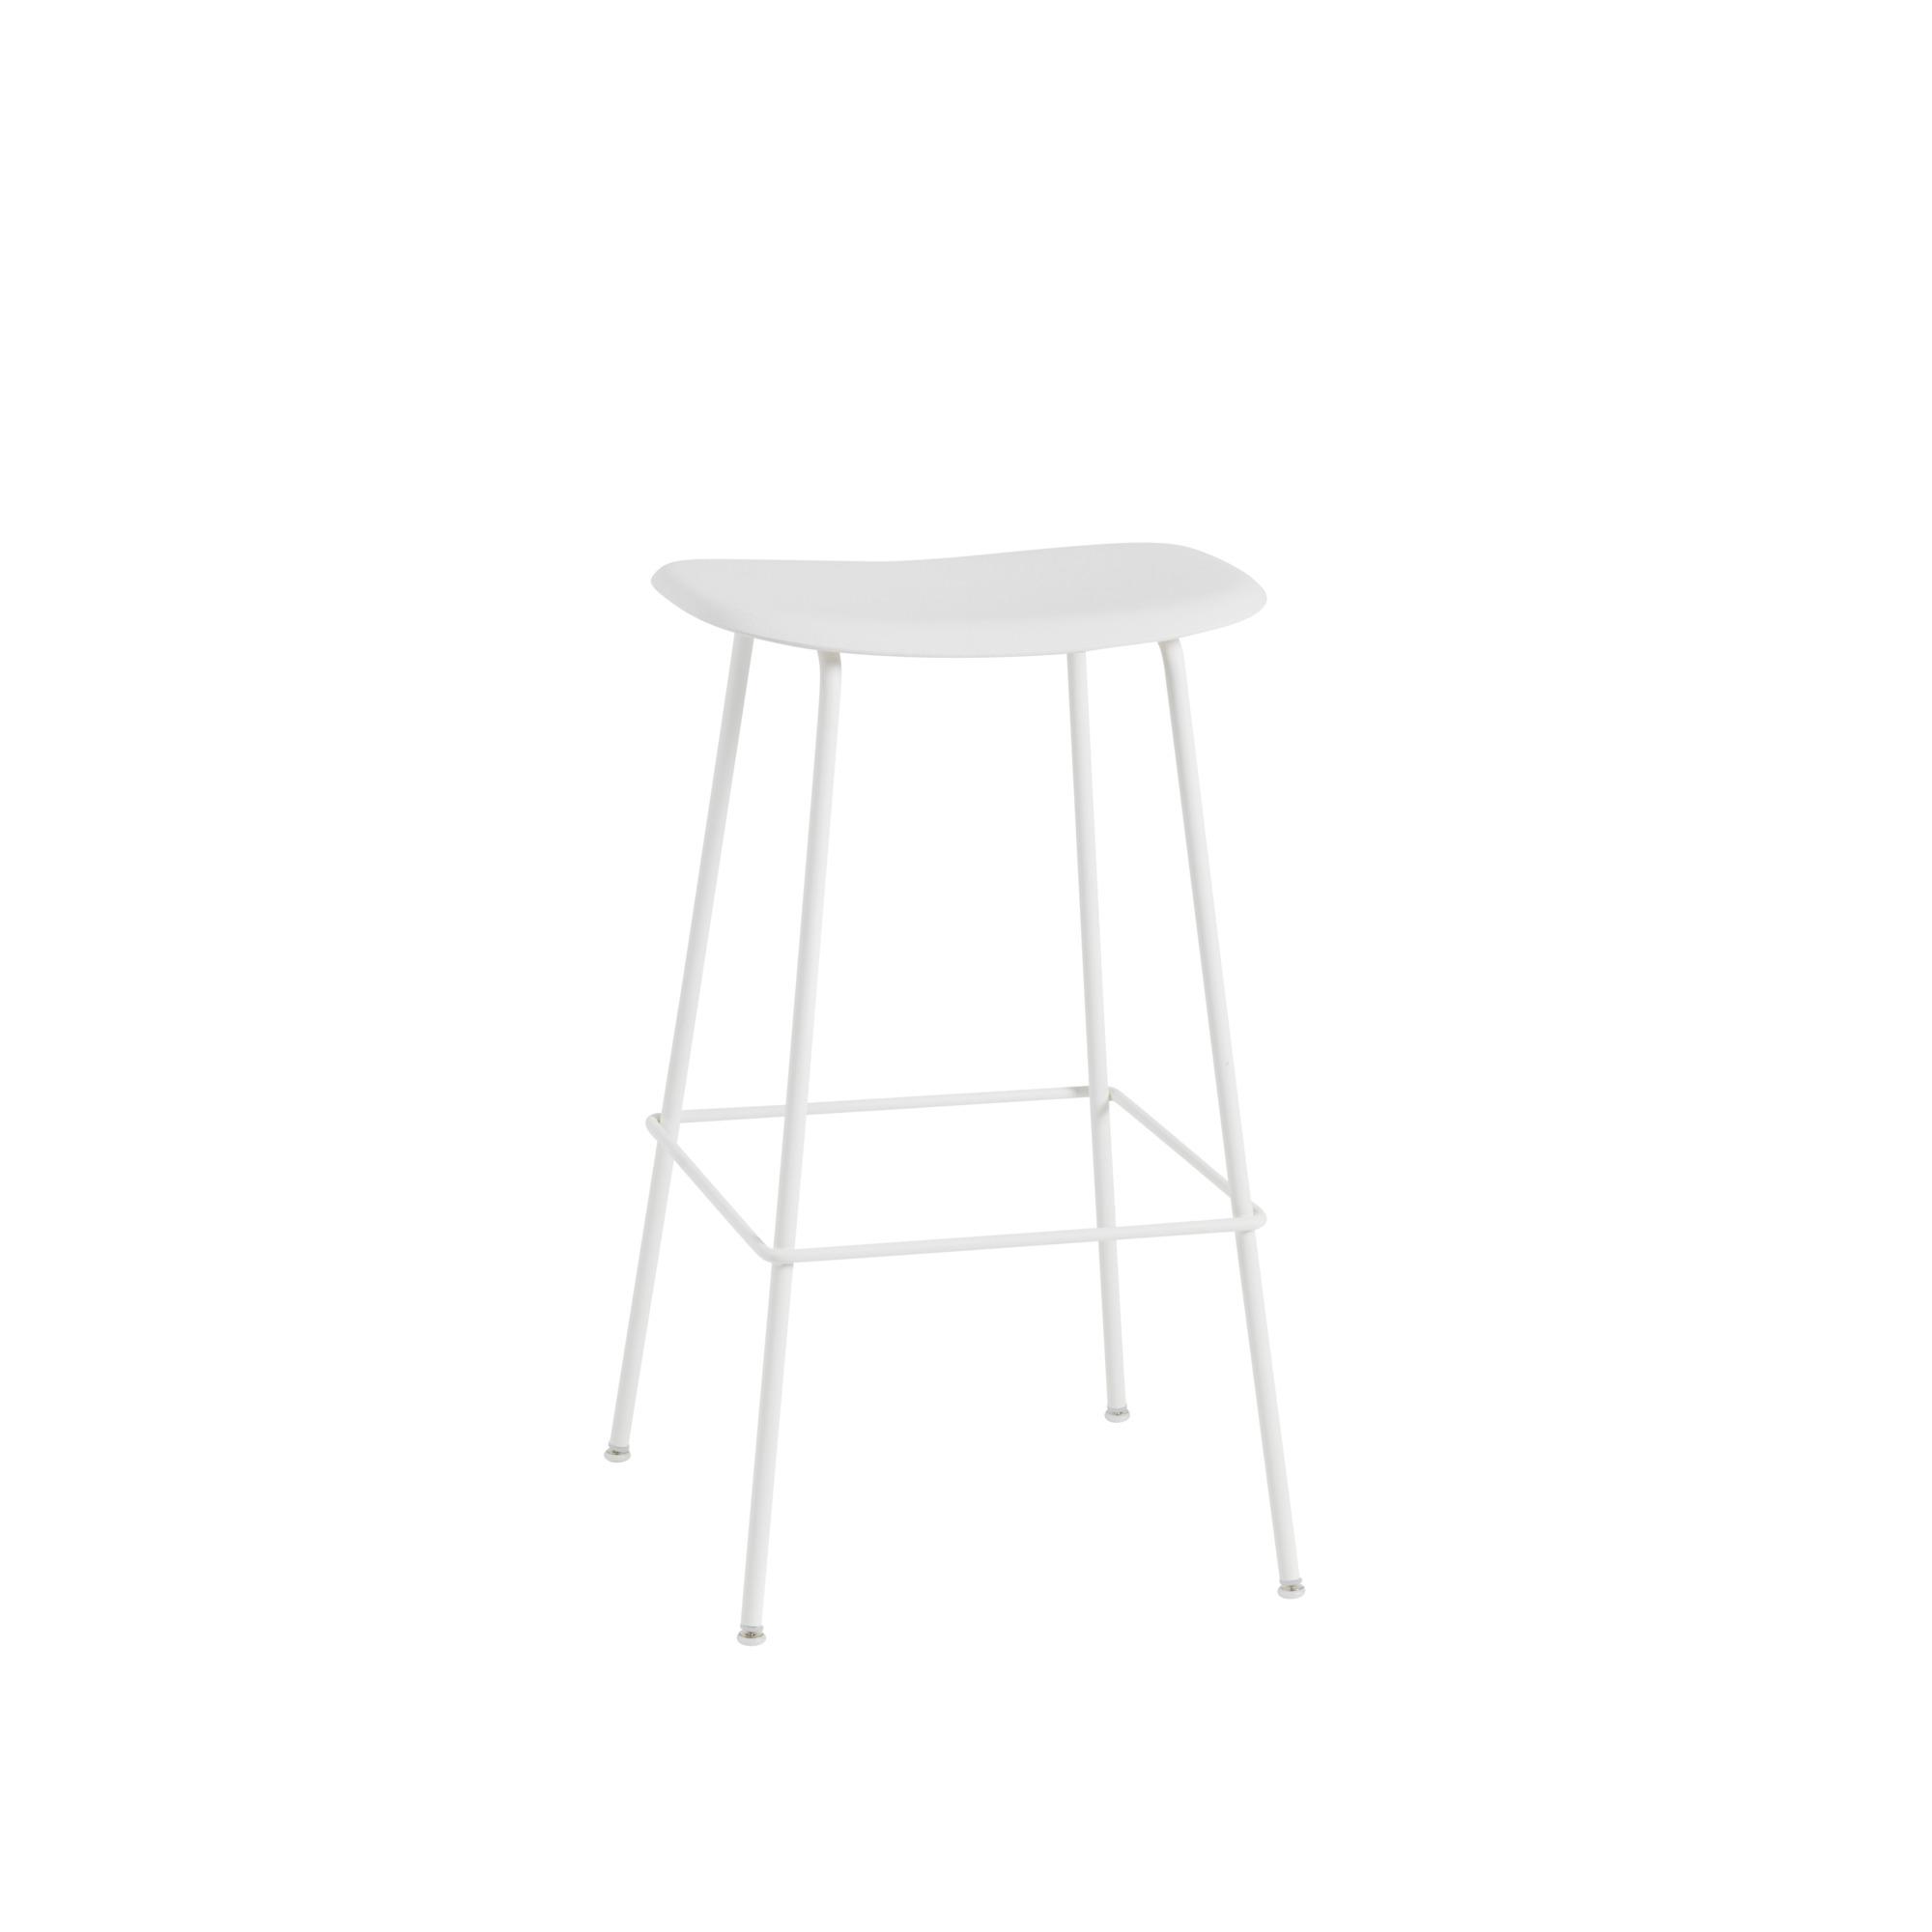 Fiber Bar Stool white / white Muuto 75 cm natural